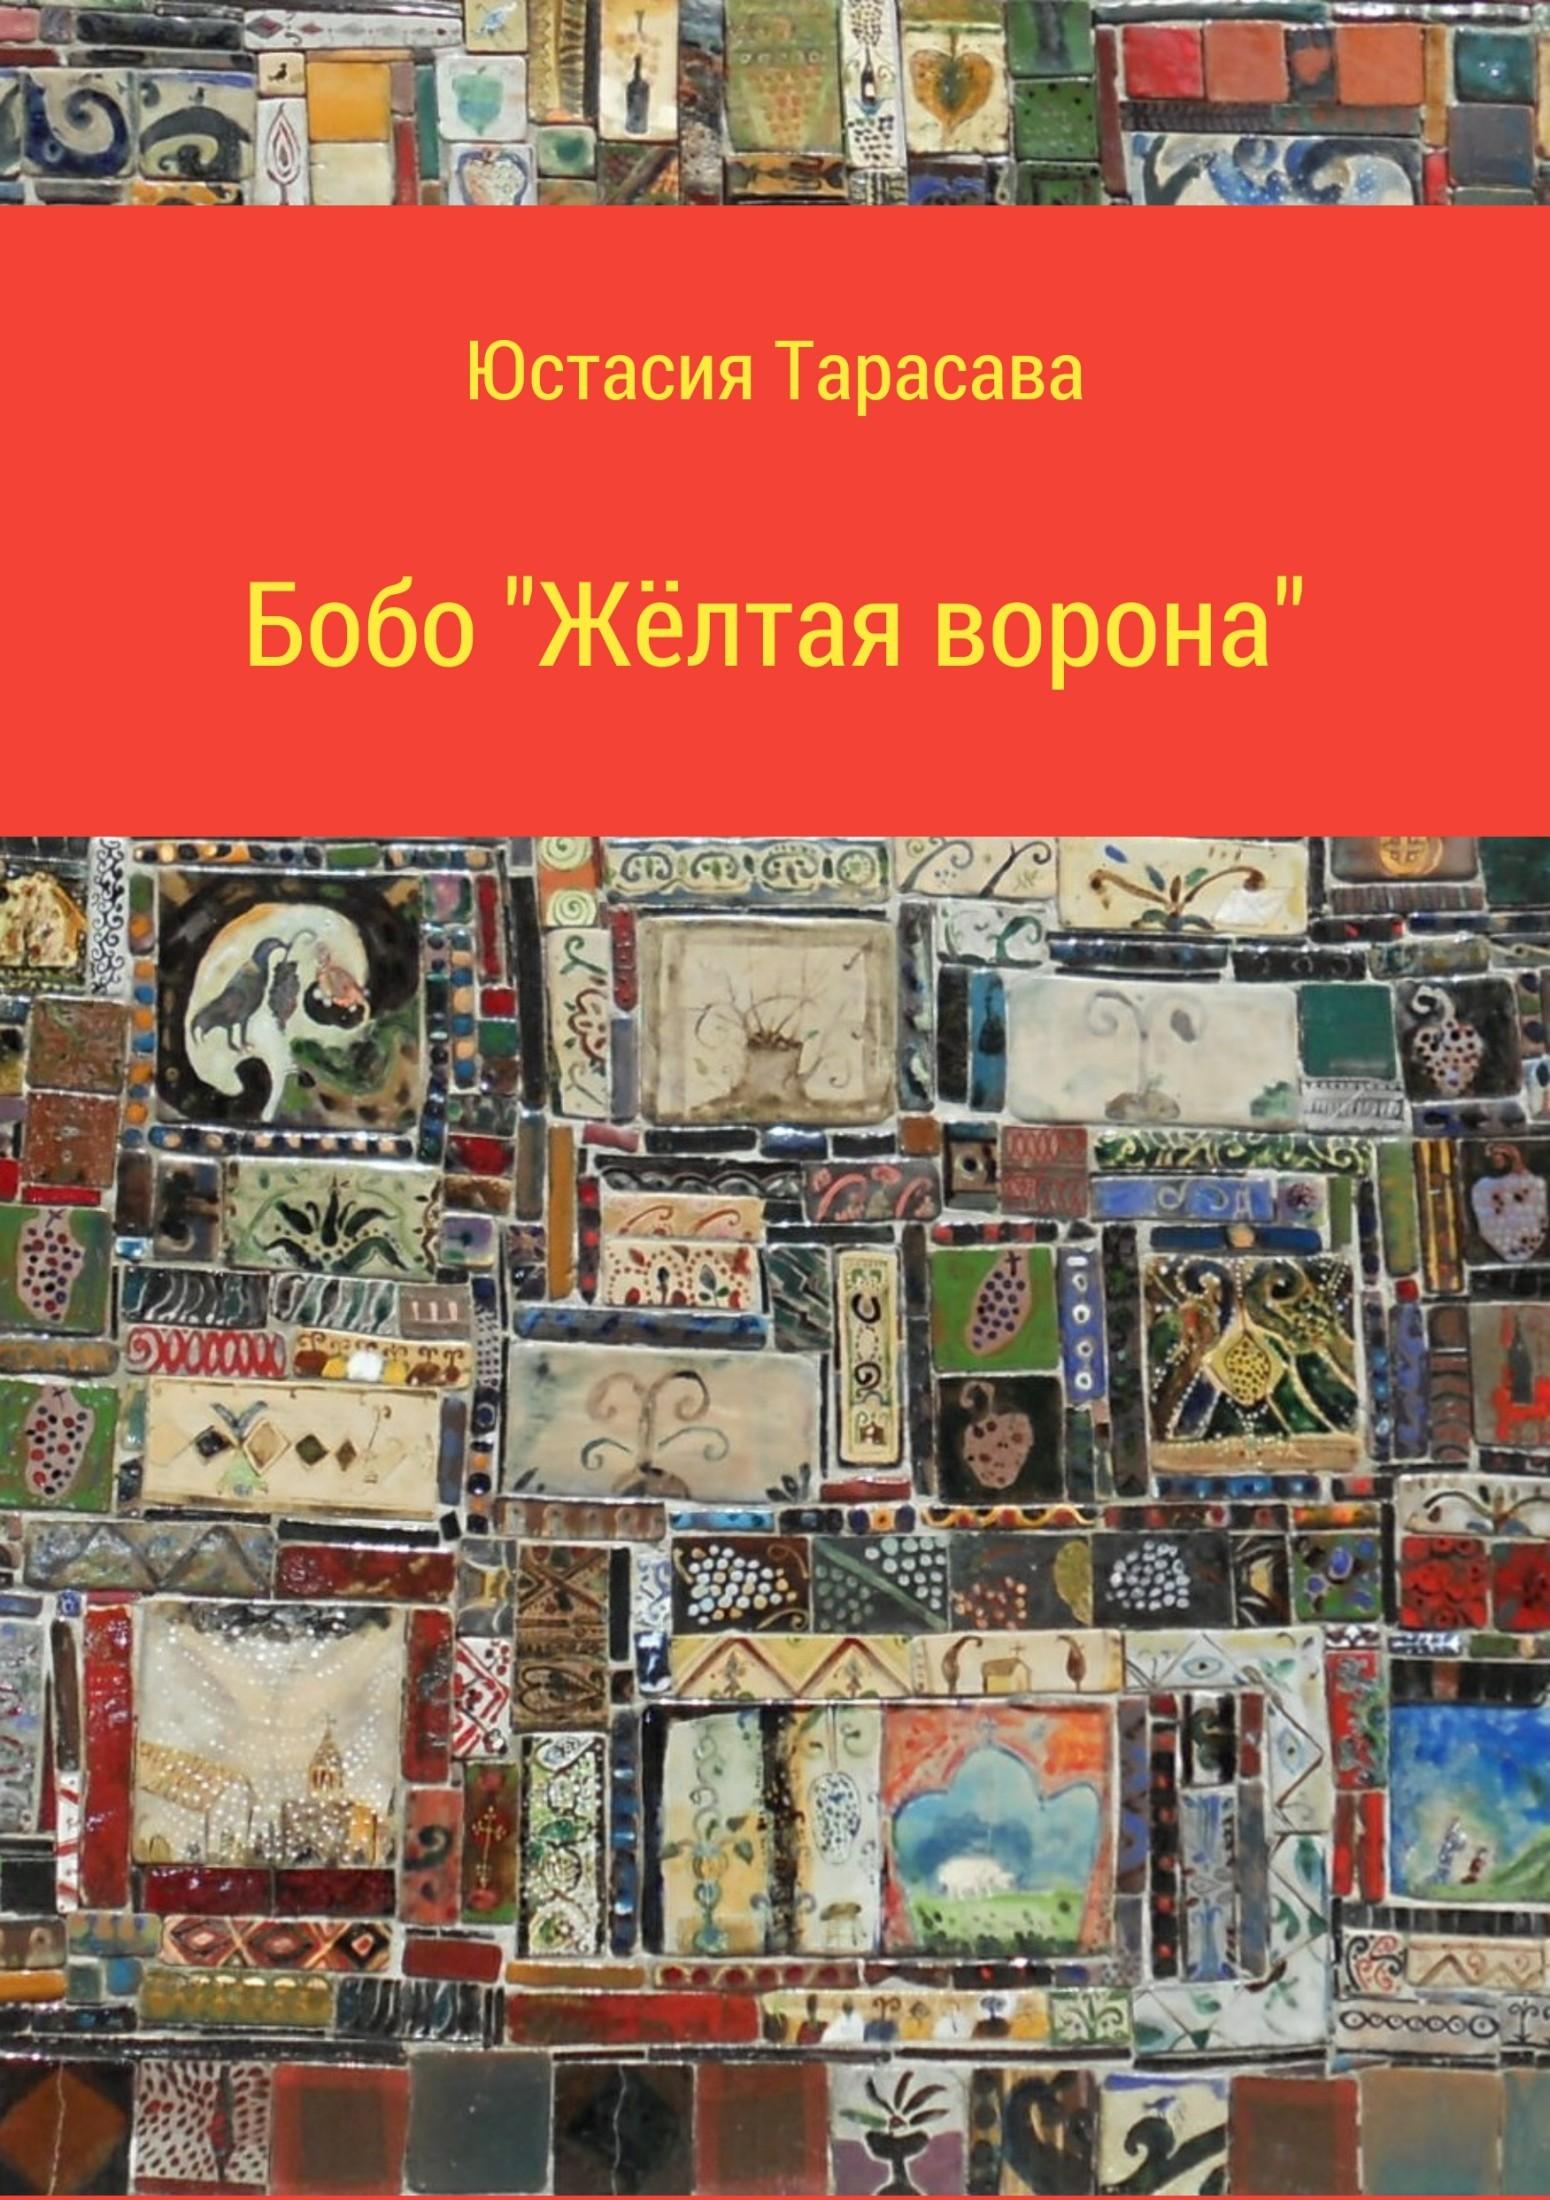 Юстасия Тарасава бесплатно